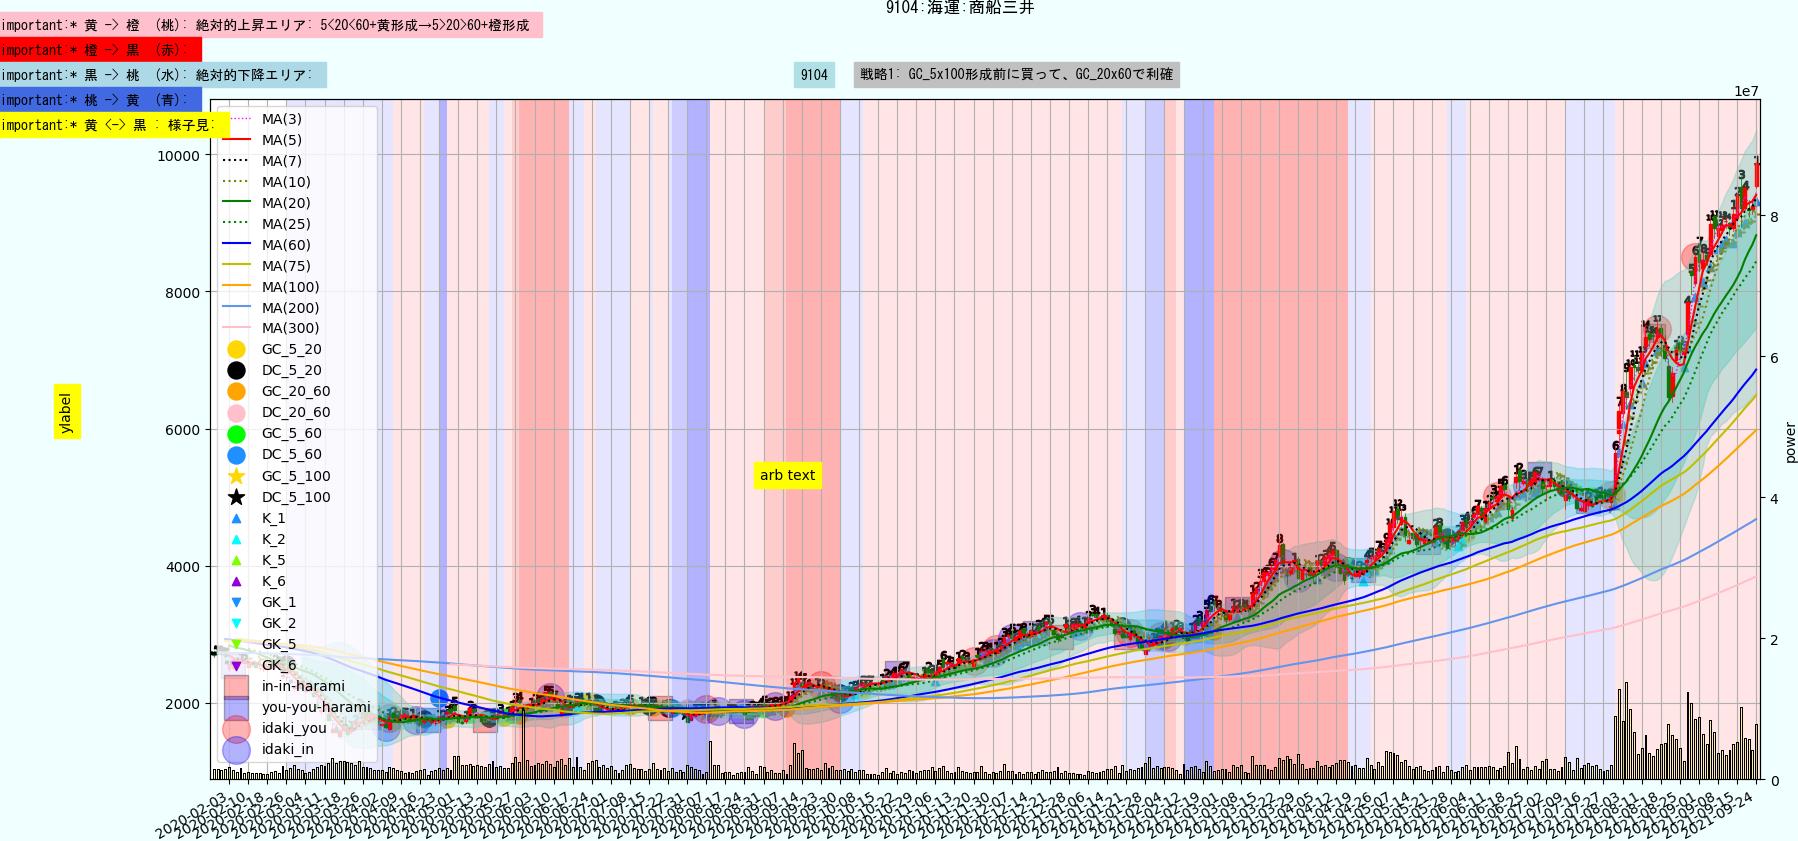 https://trident-capital-strage.s3.ap-northeast-1.amazonaws.com/charts/20210924/9104.png